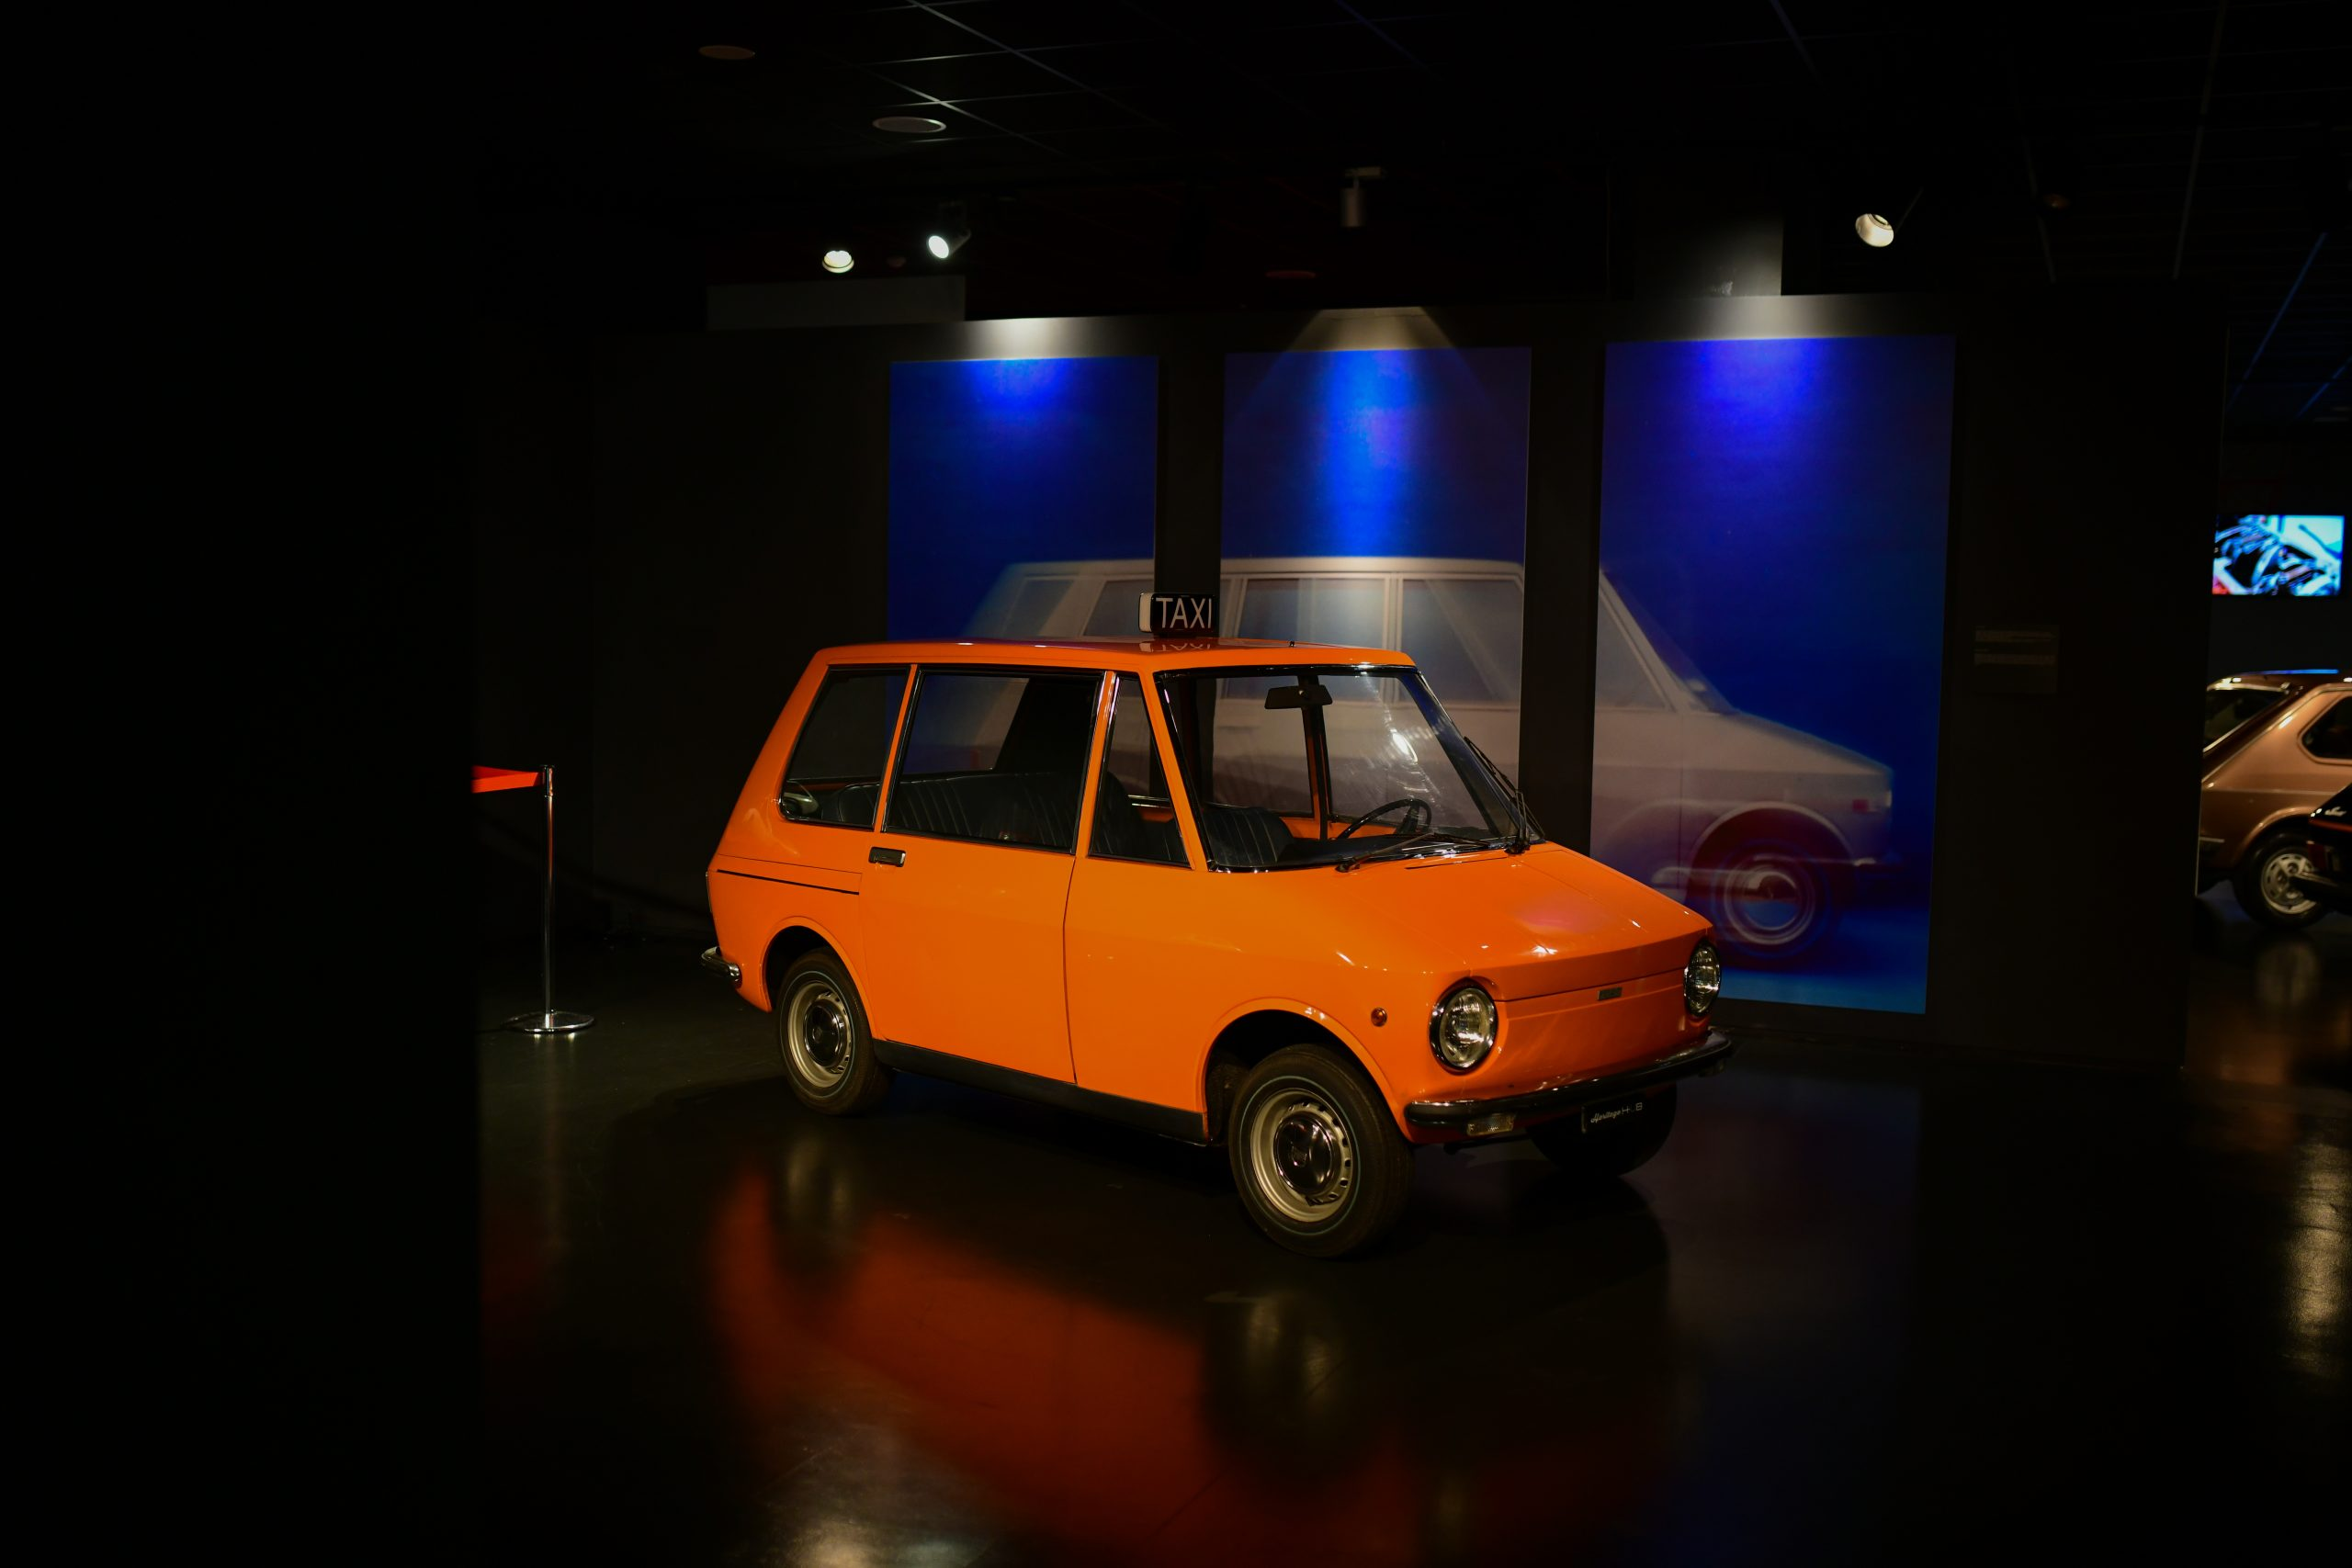 02 Fiat City Taxi scaled H Fiat, o ιδιοφυής σχεδιαστής και ένα περίεργο ταξί Fiat, retro, ειδήσεις, Νέα